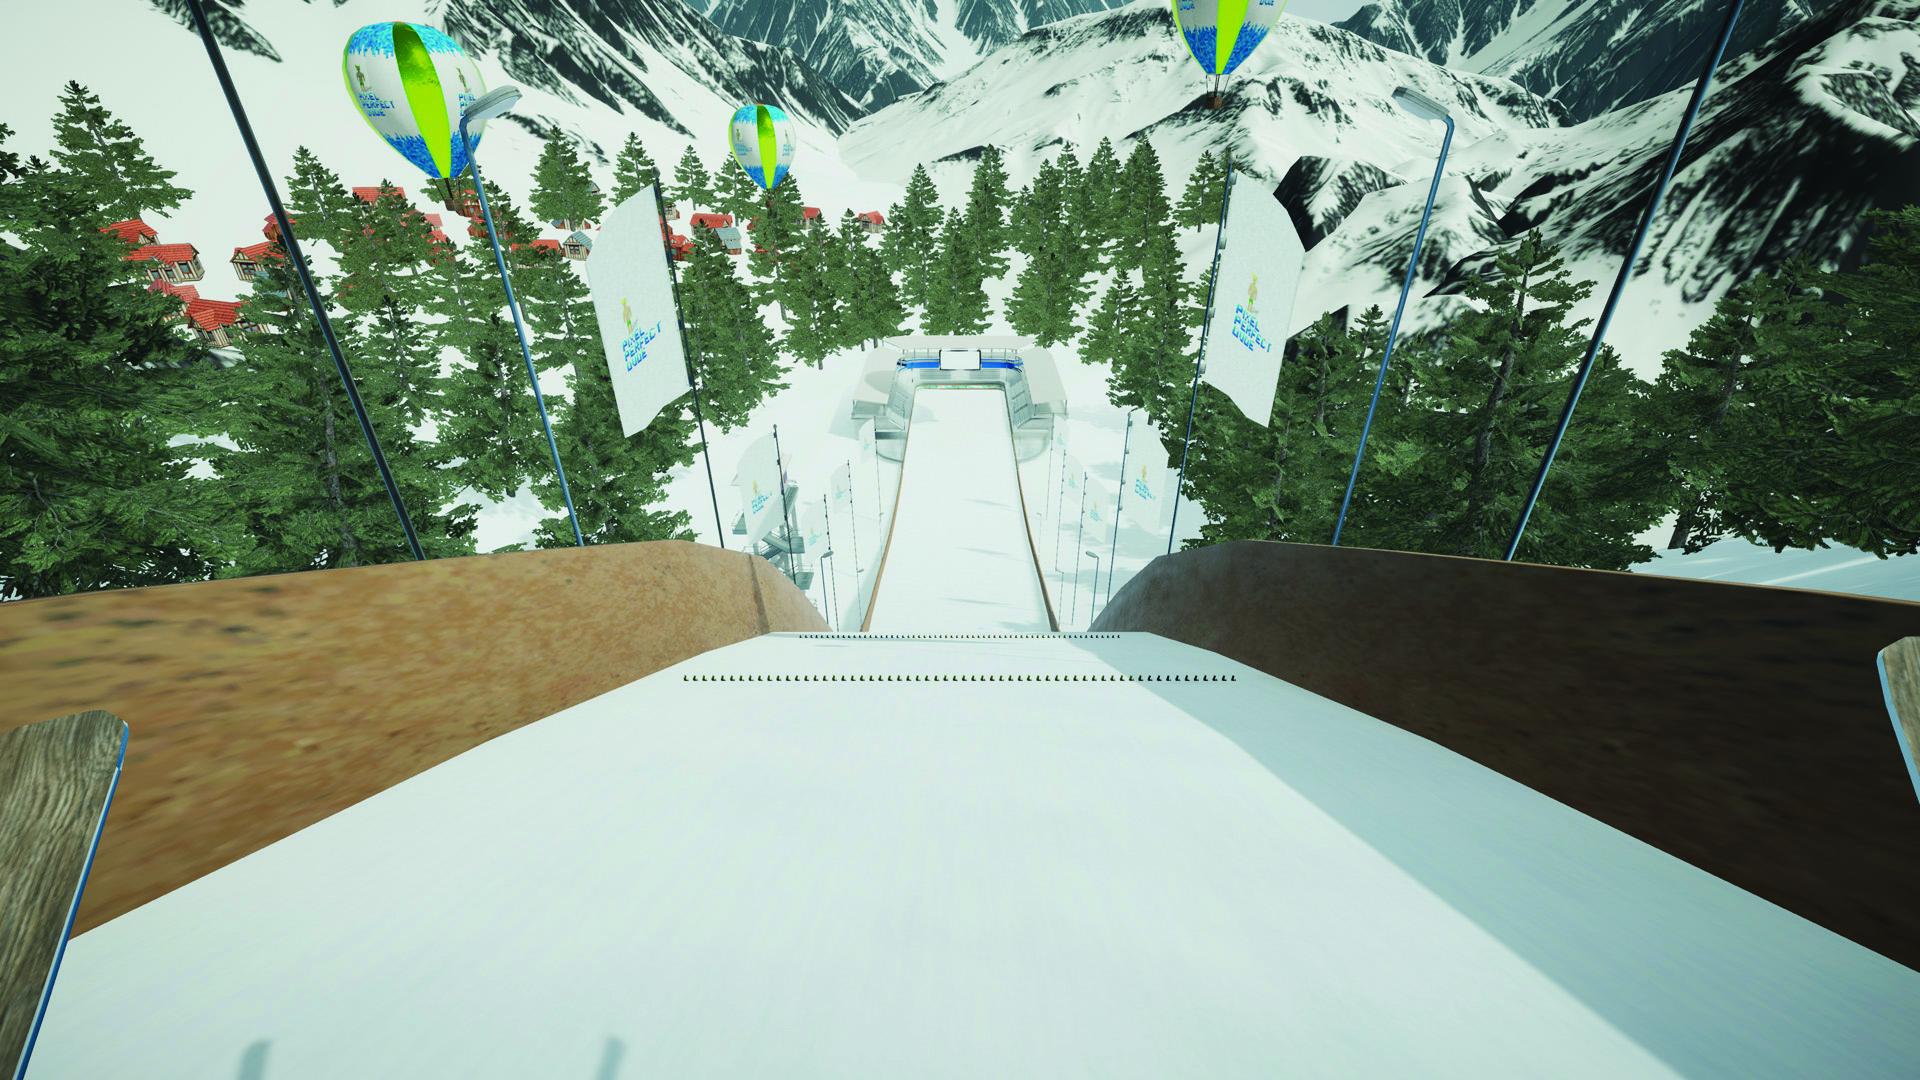 Symulator skoków narciarskich VR